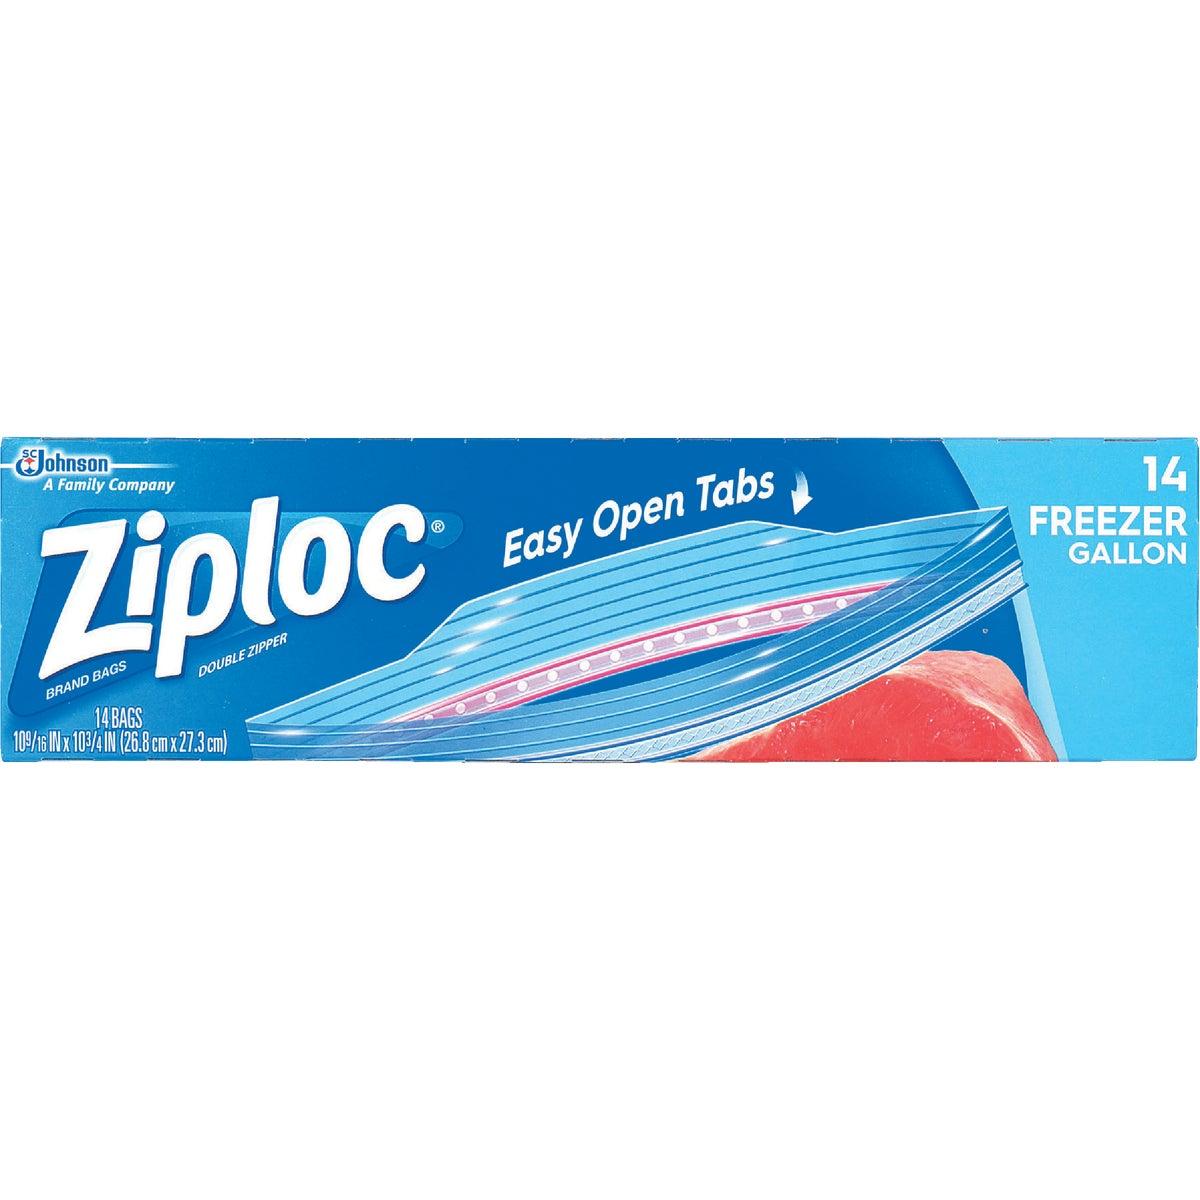 GAL ZIPLOC FREEZER BAG - 00389 by Sc Johnson